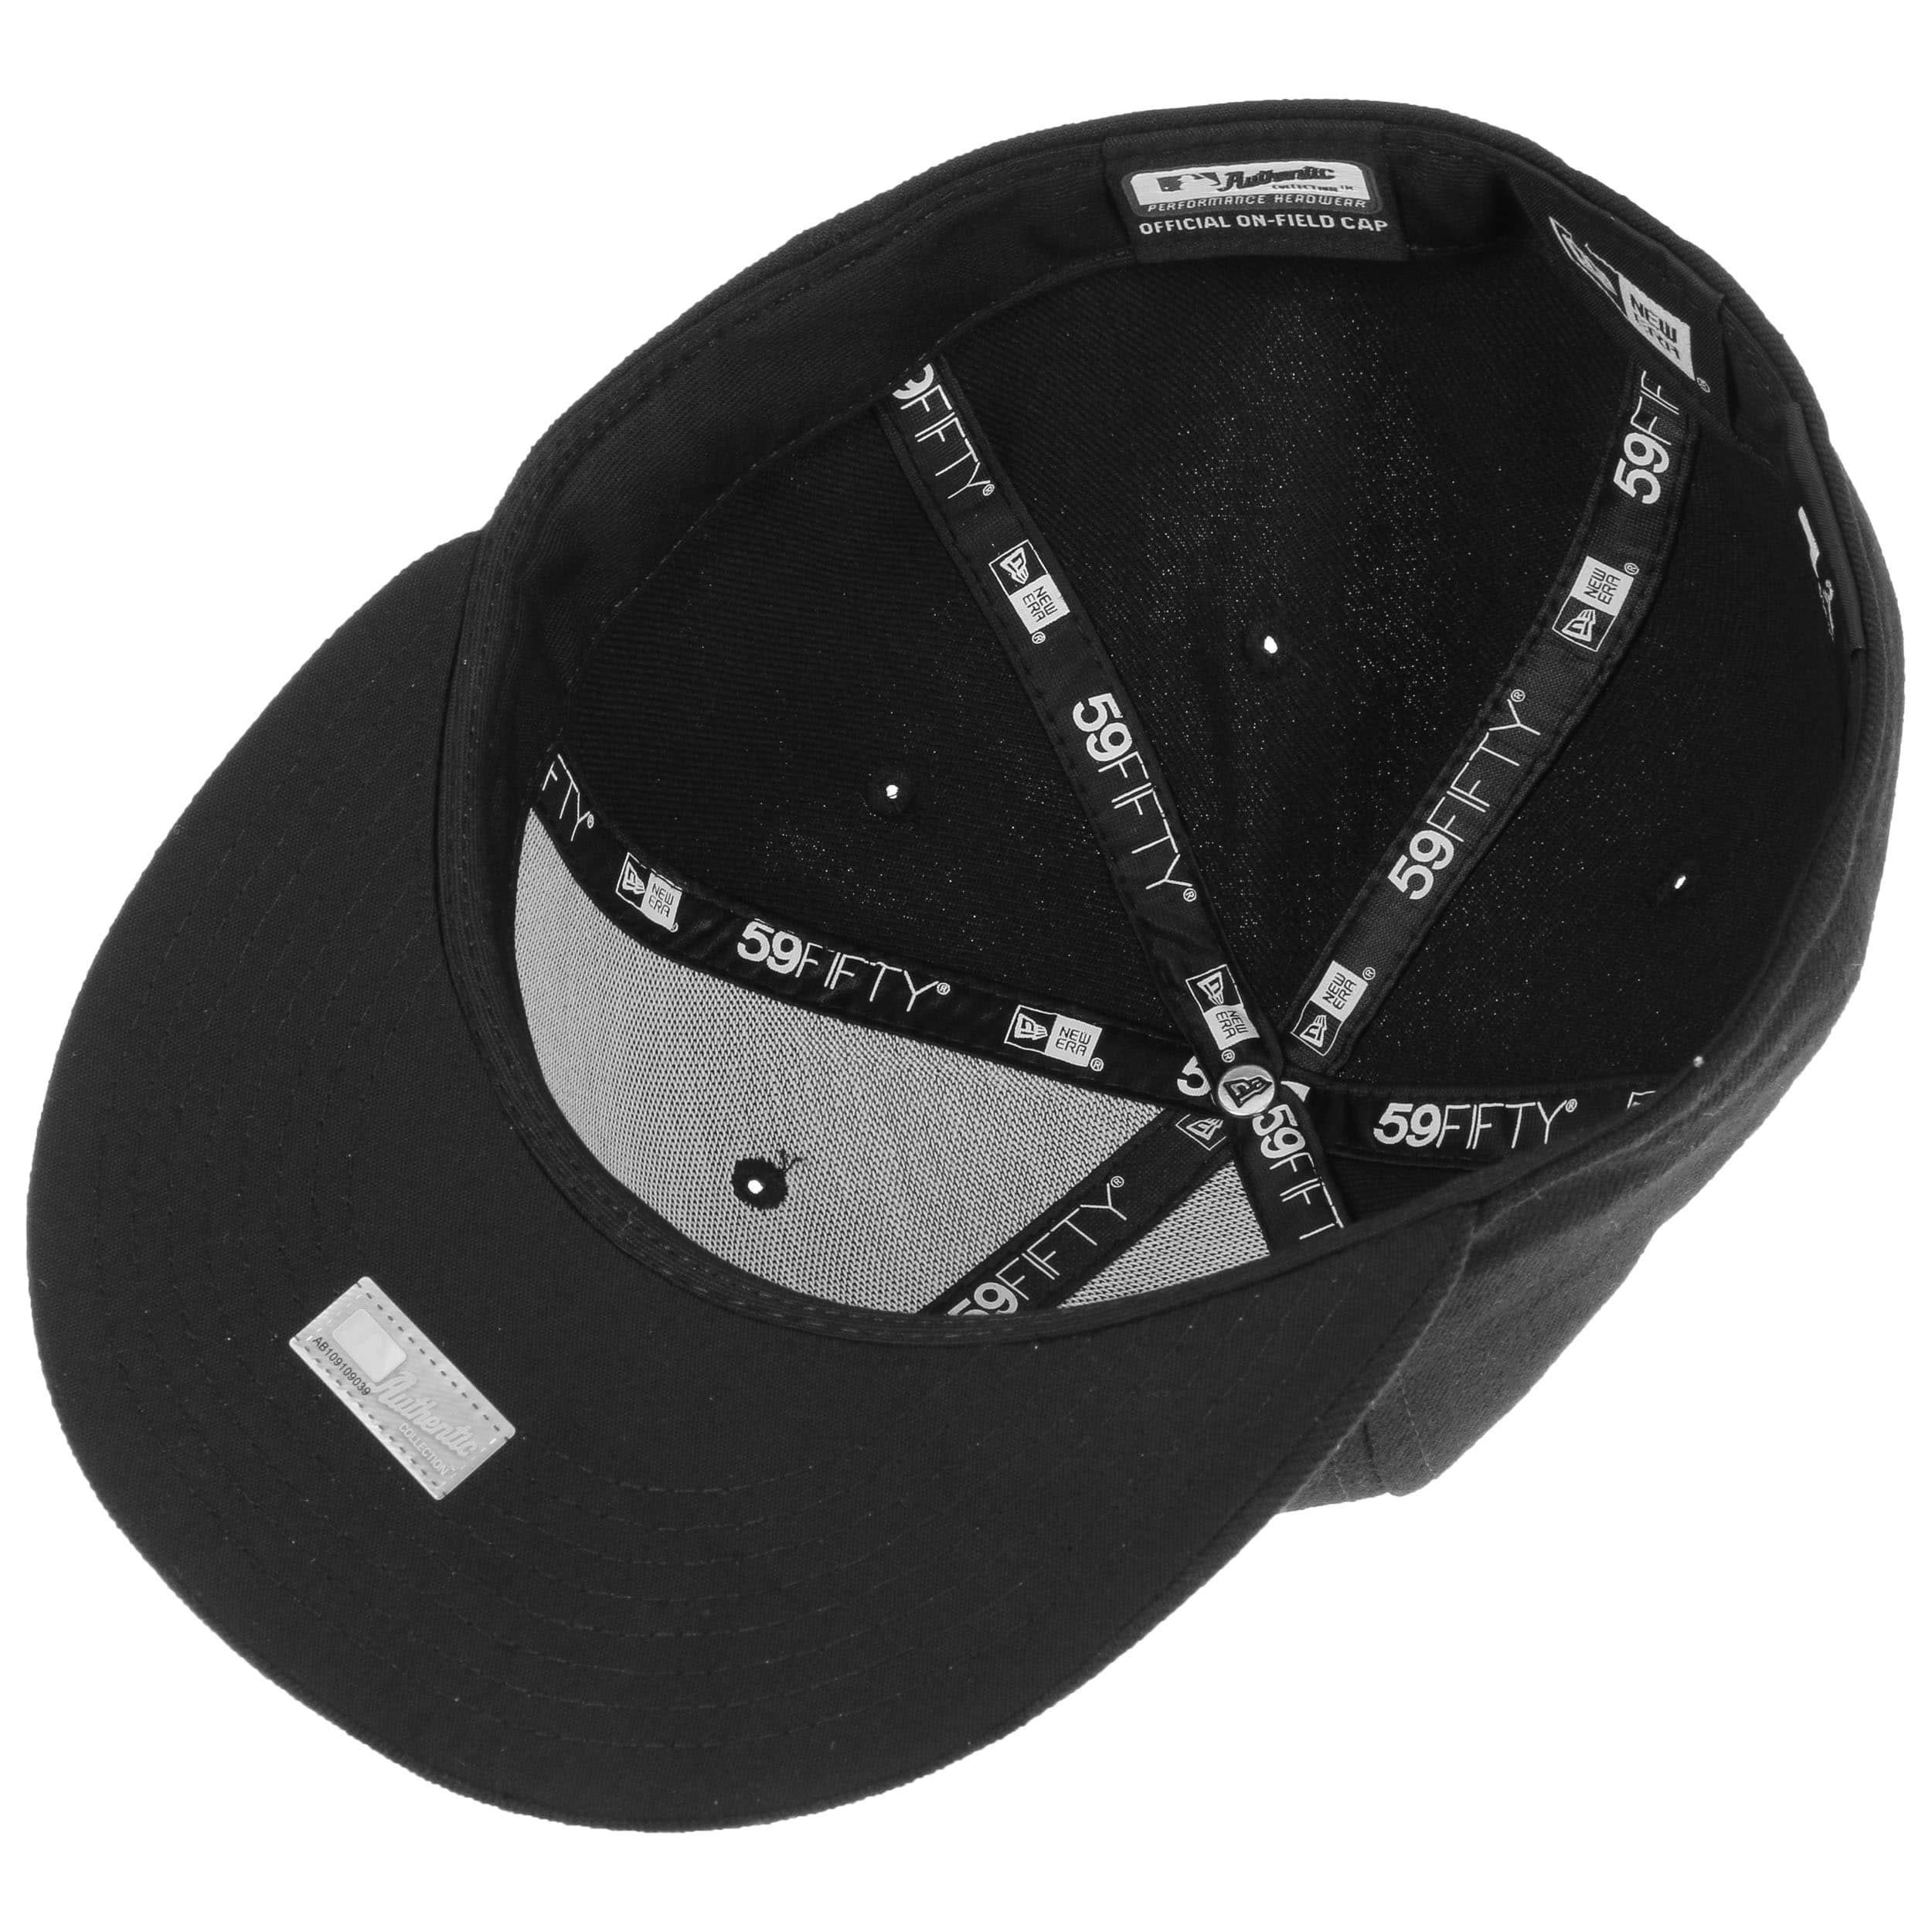 ... 59Fifty TSF White Sox Cap by New Era - black 2 ... 59322bc501b